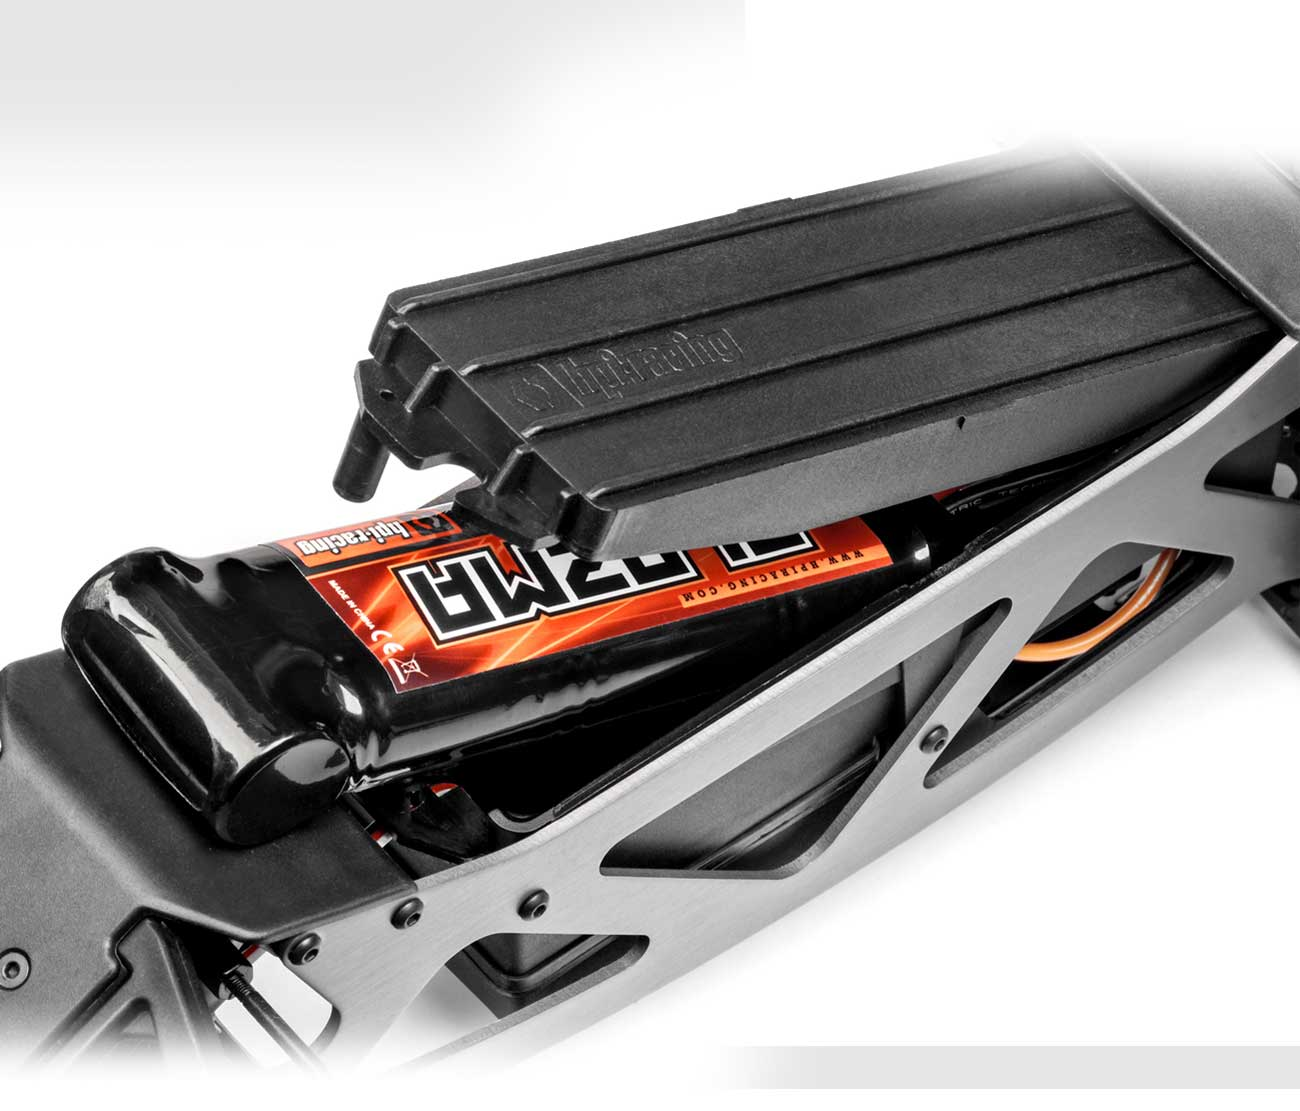 http://hpiracing.world/assets/images/kits/115116x/batterybox2.jpg